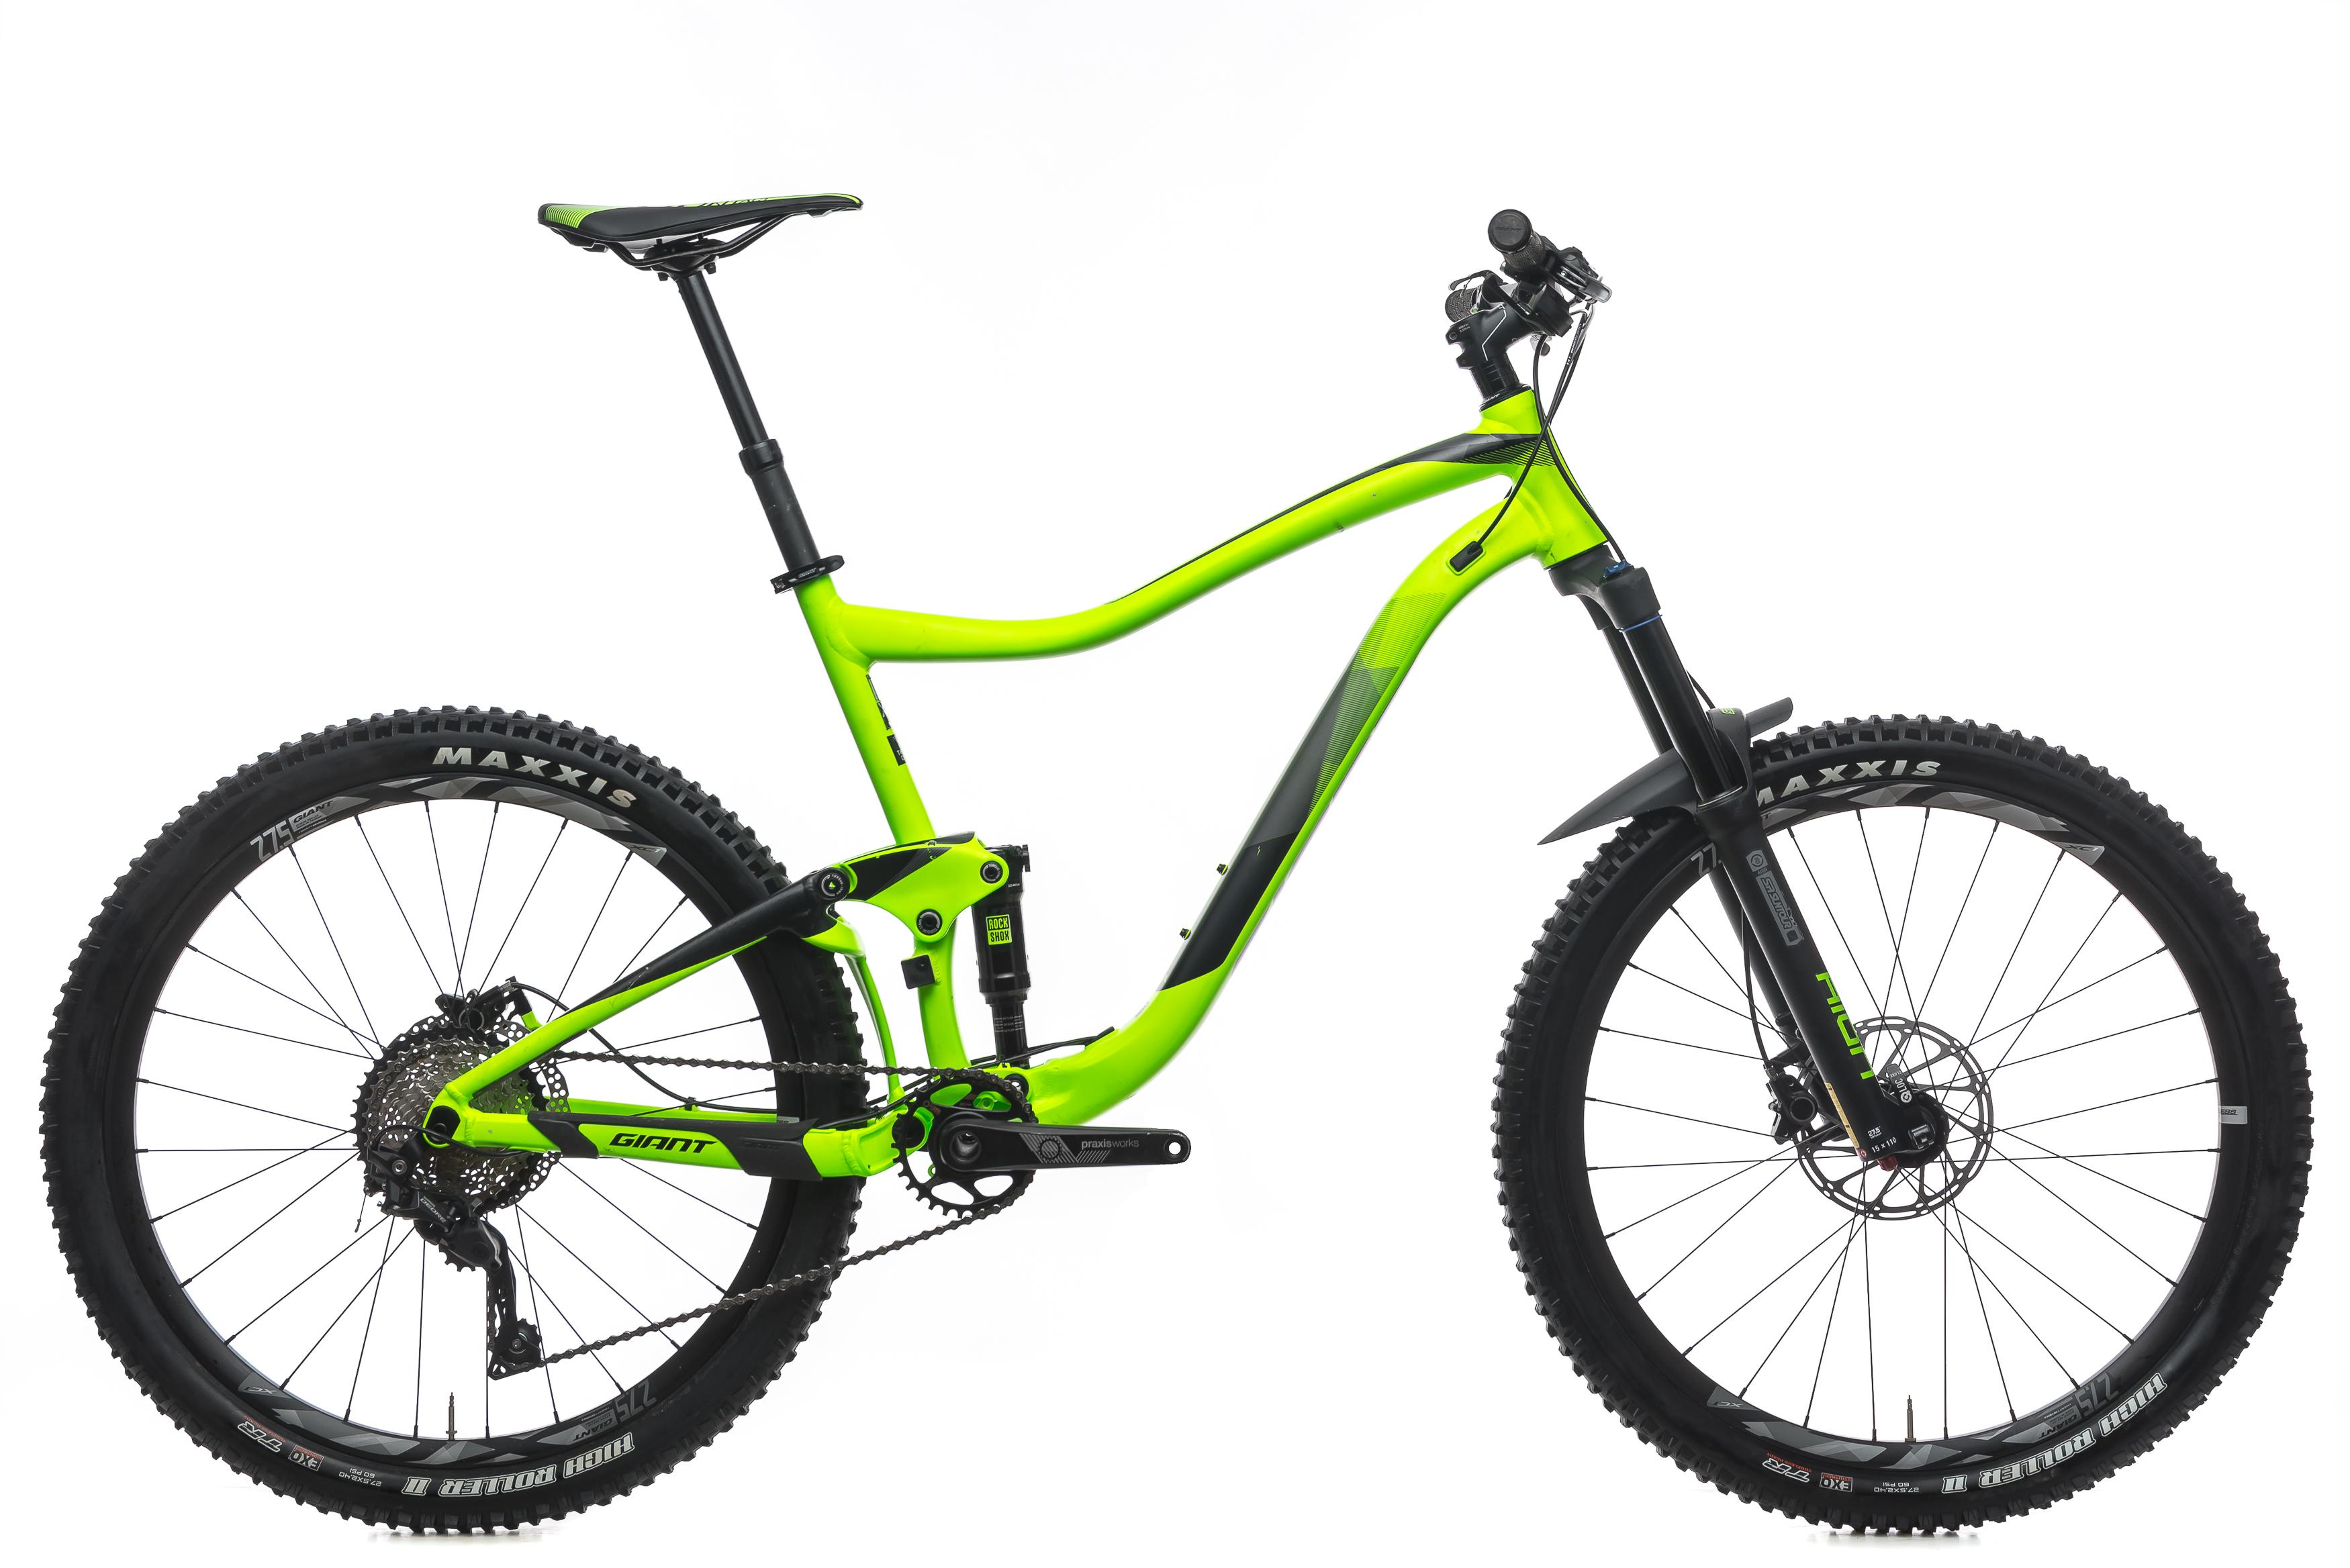 e22a060f088 2018 Giant Trance 3 Mountain Bike X-Large 27.5